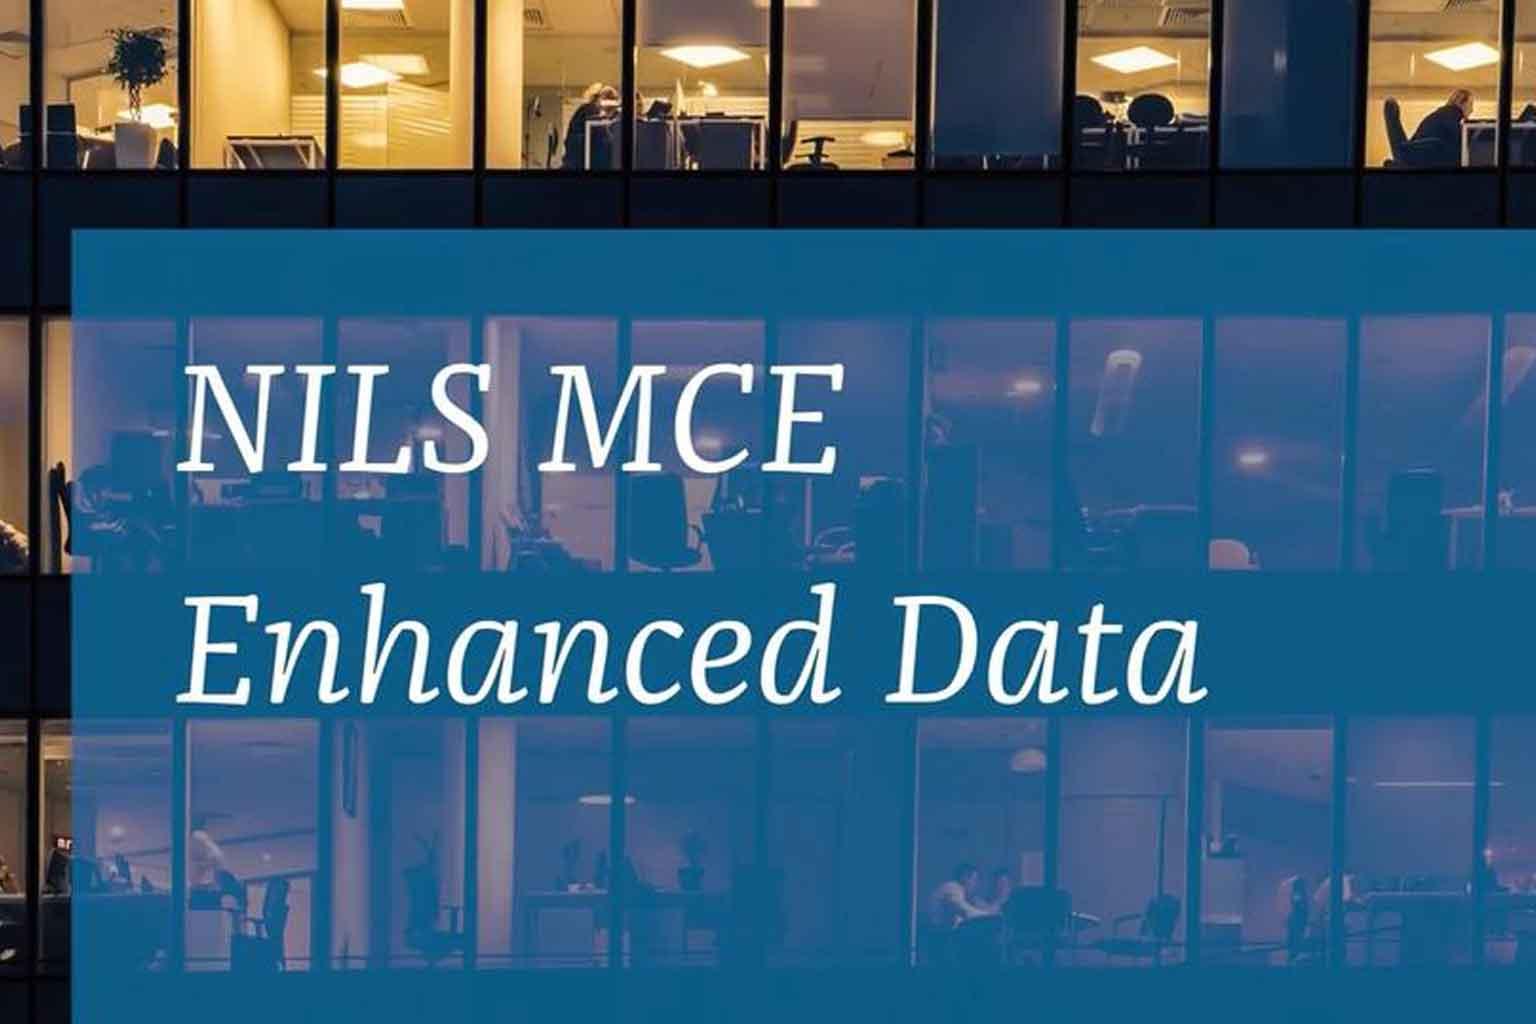 NILS MCE Enhanced Data